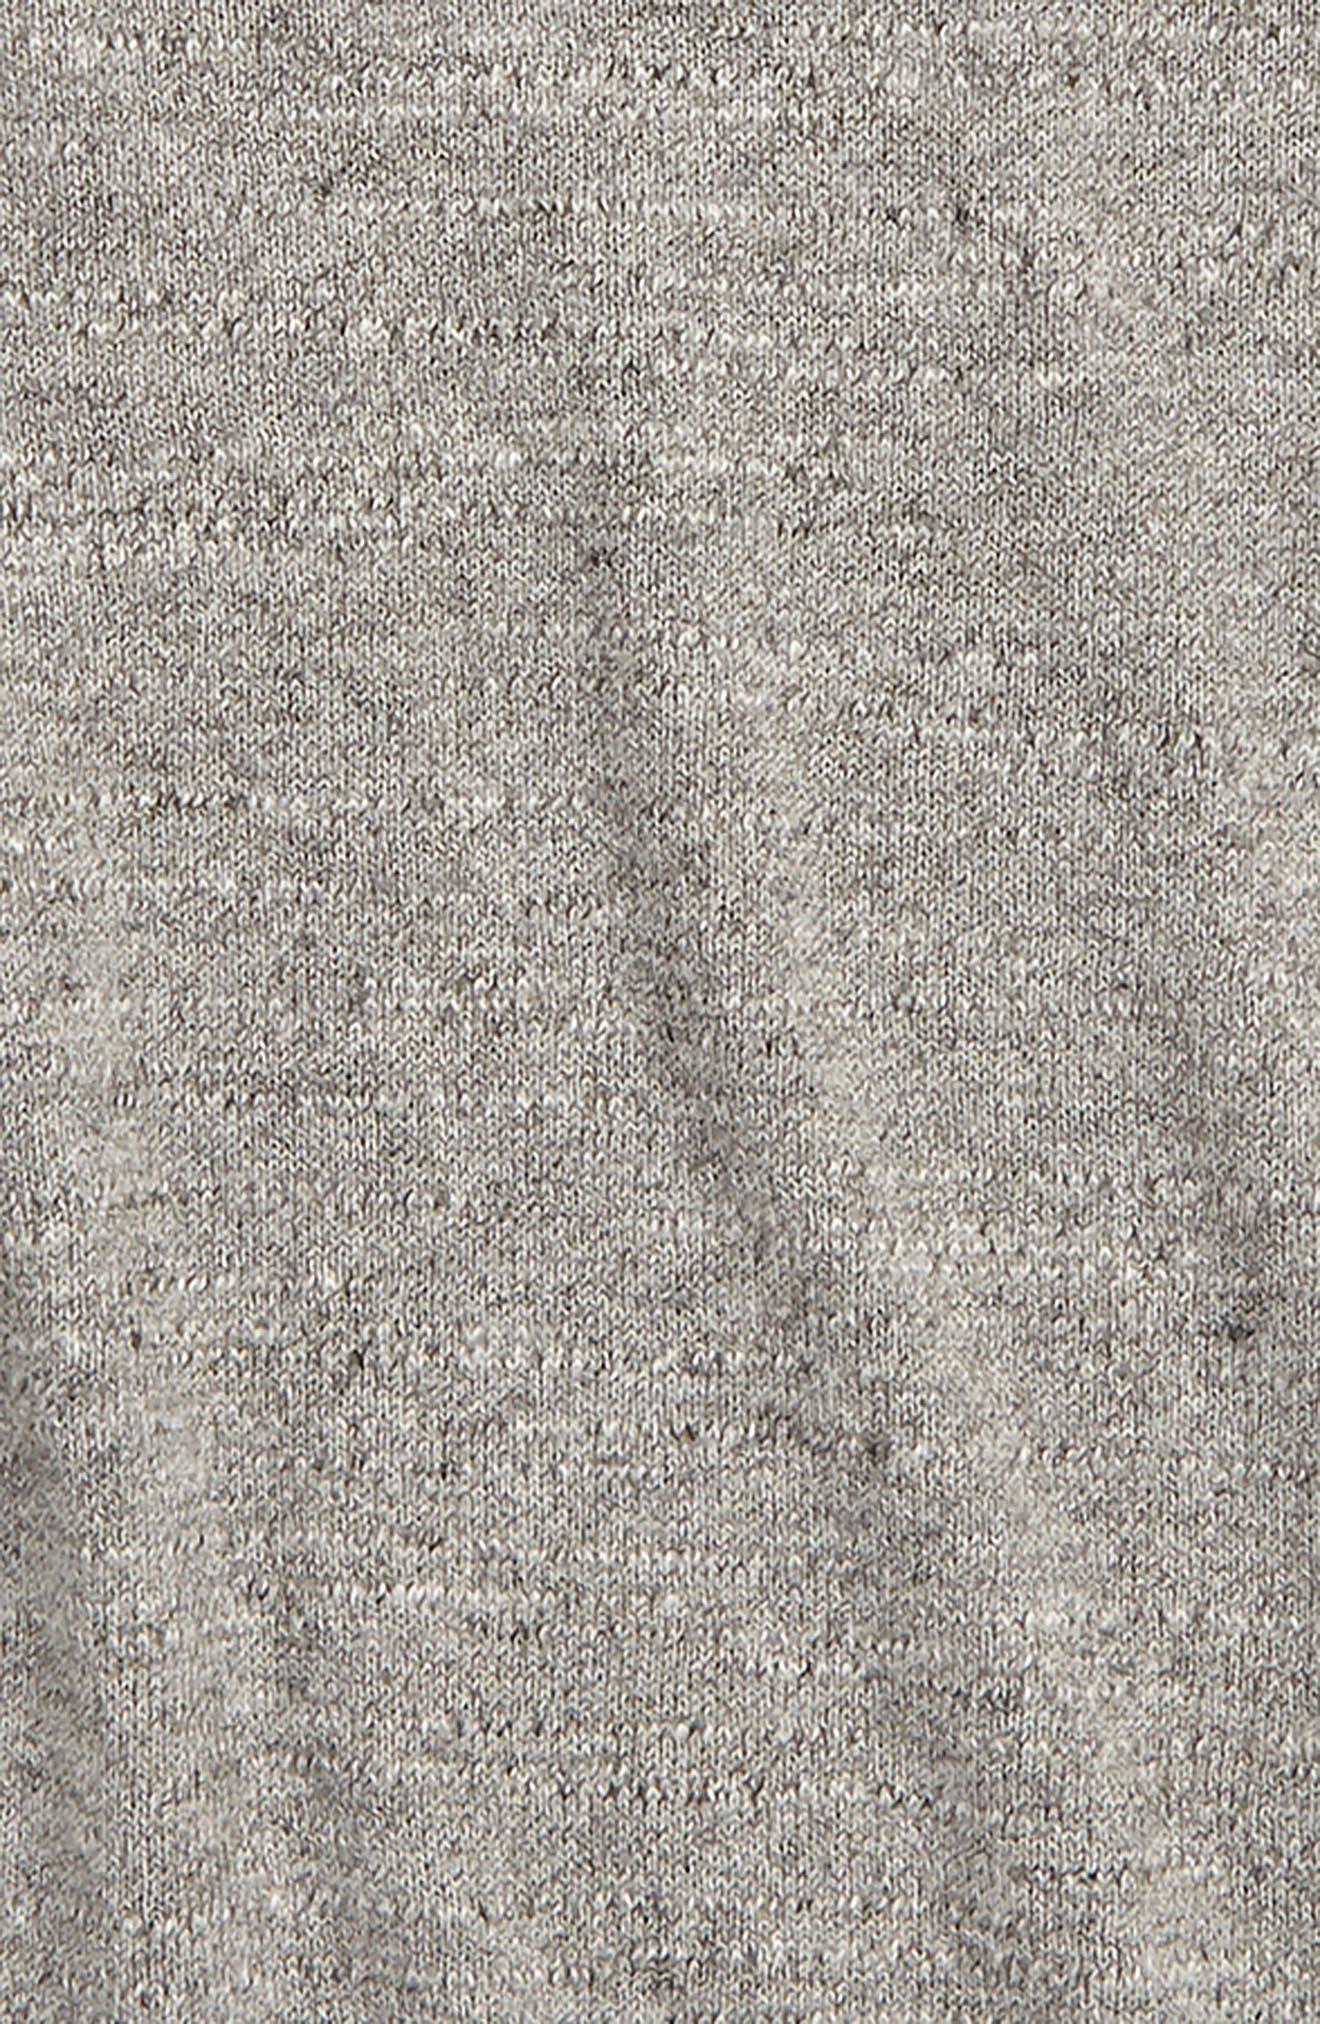 Cotton Crewneck Sweater,                             Alternate thumbnail 2, color,                             HEATHER GREY INDIGO